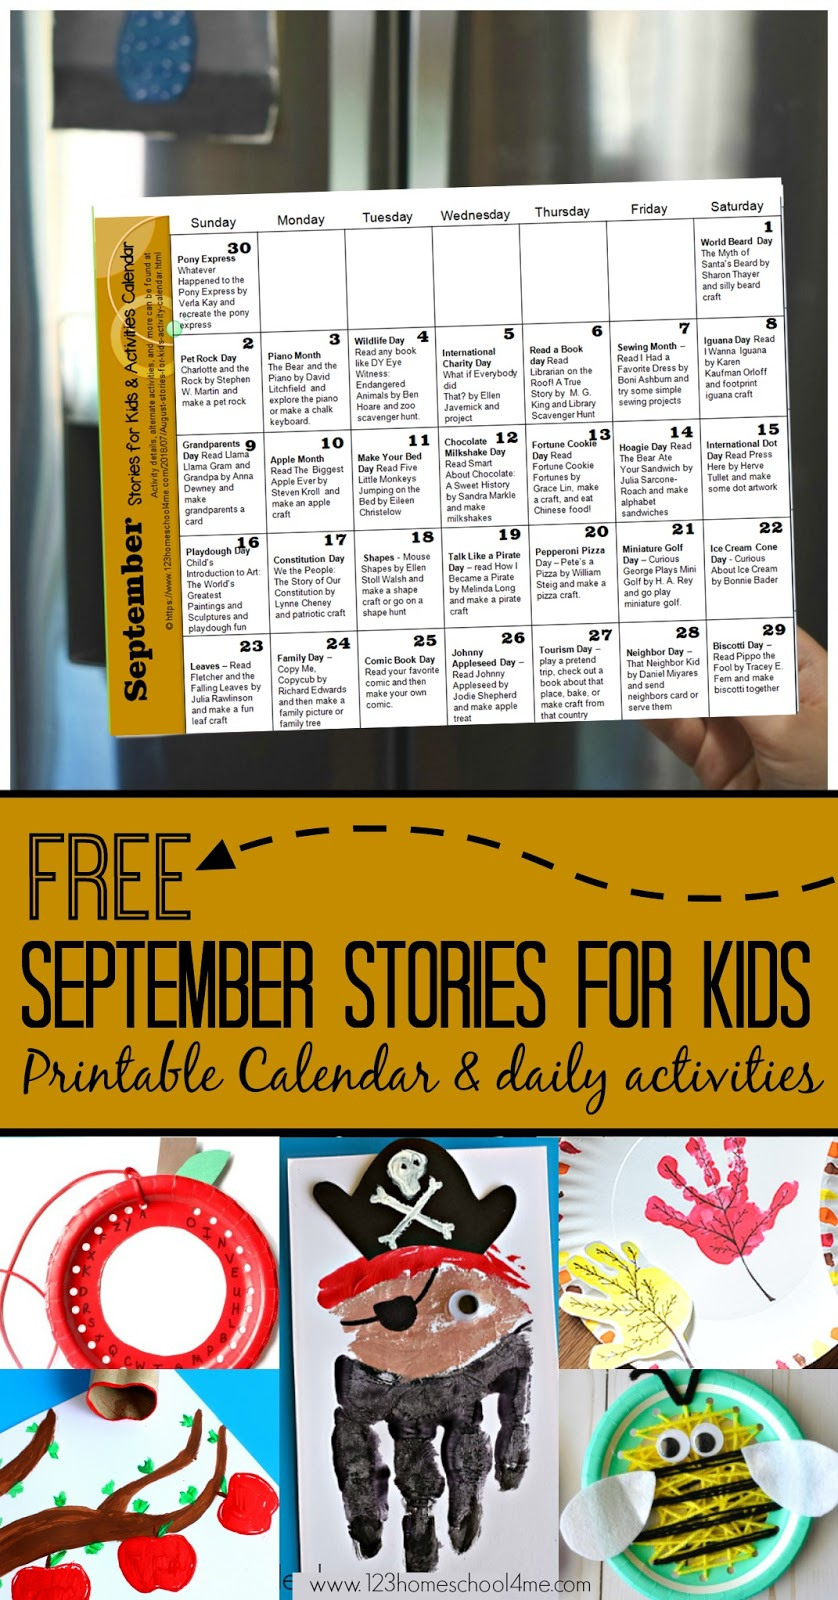 September Stories For Kids Activity Calendar